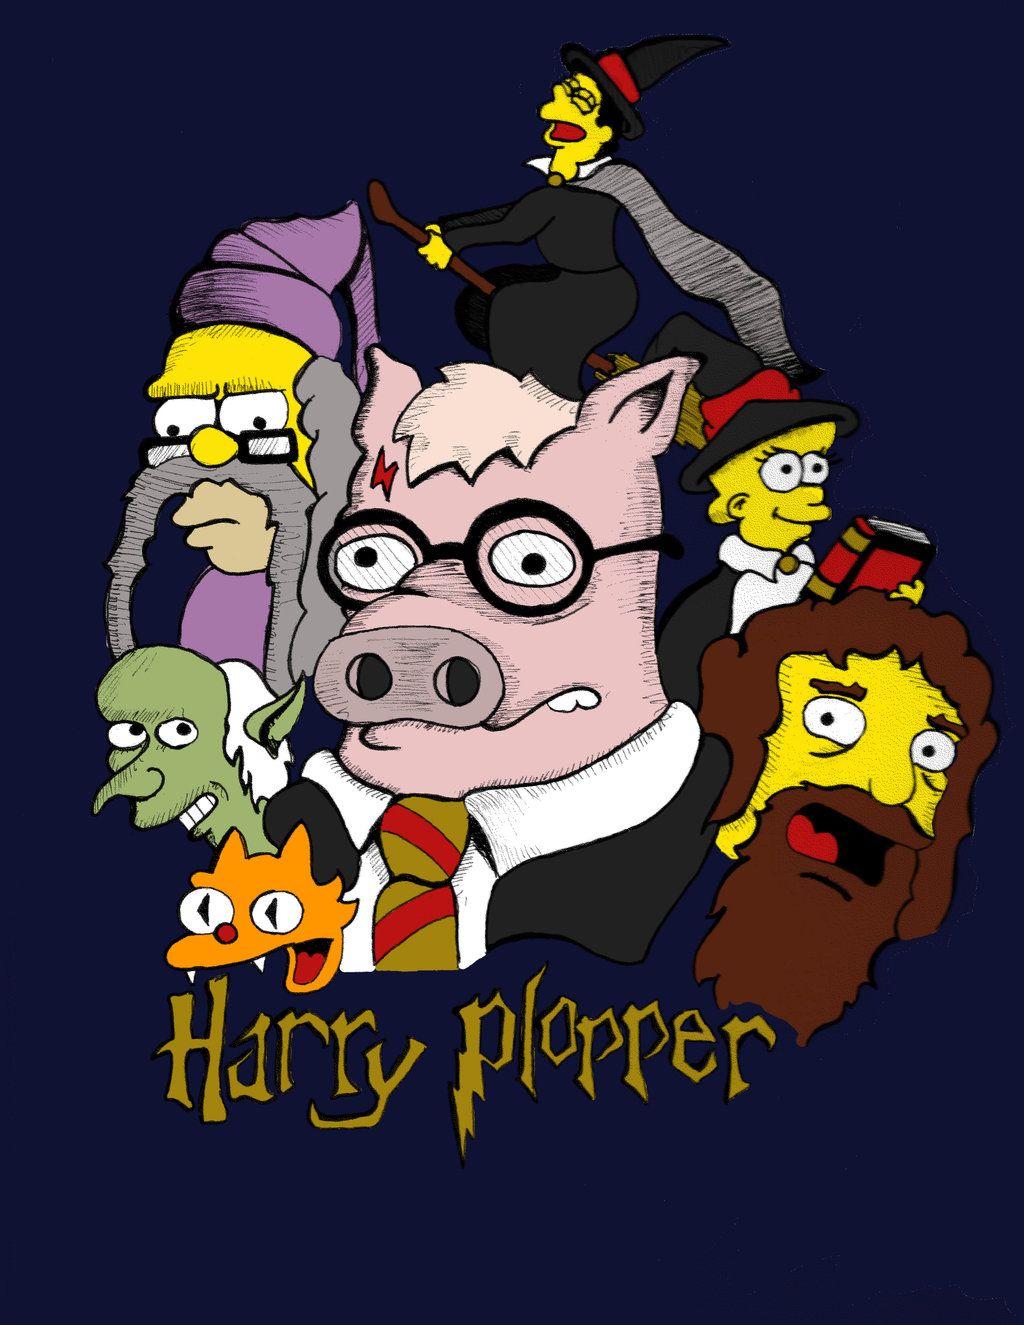 Harry Plopper Harry Vault Boy The Simpsons